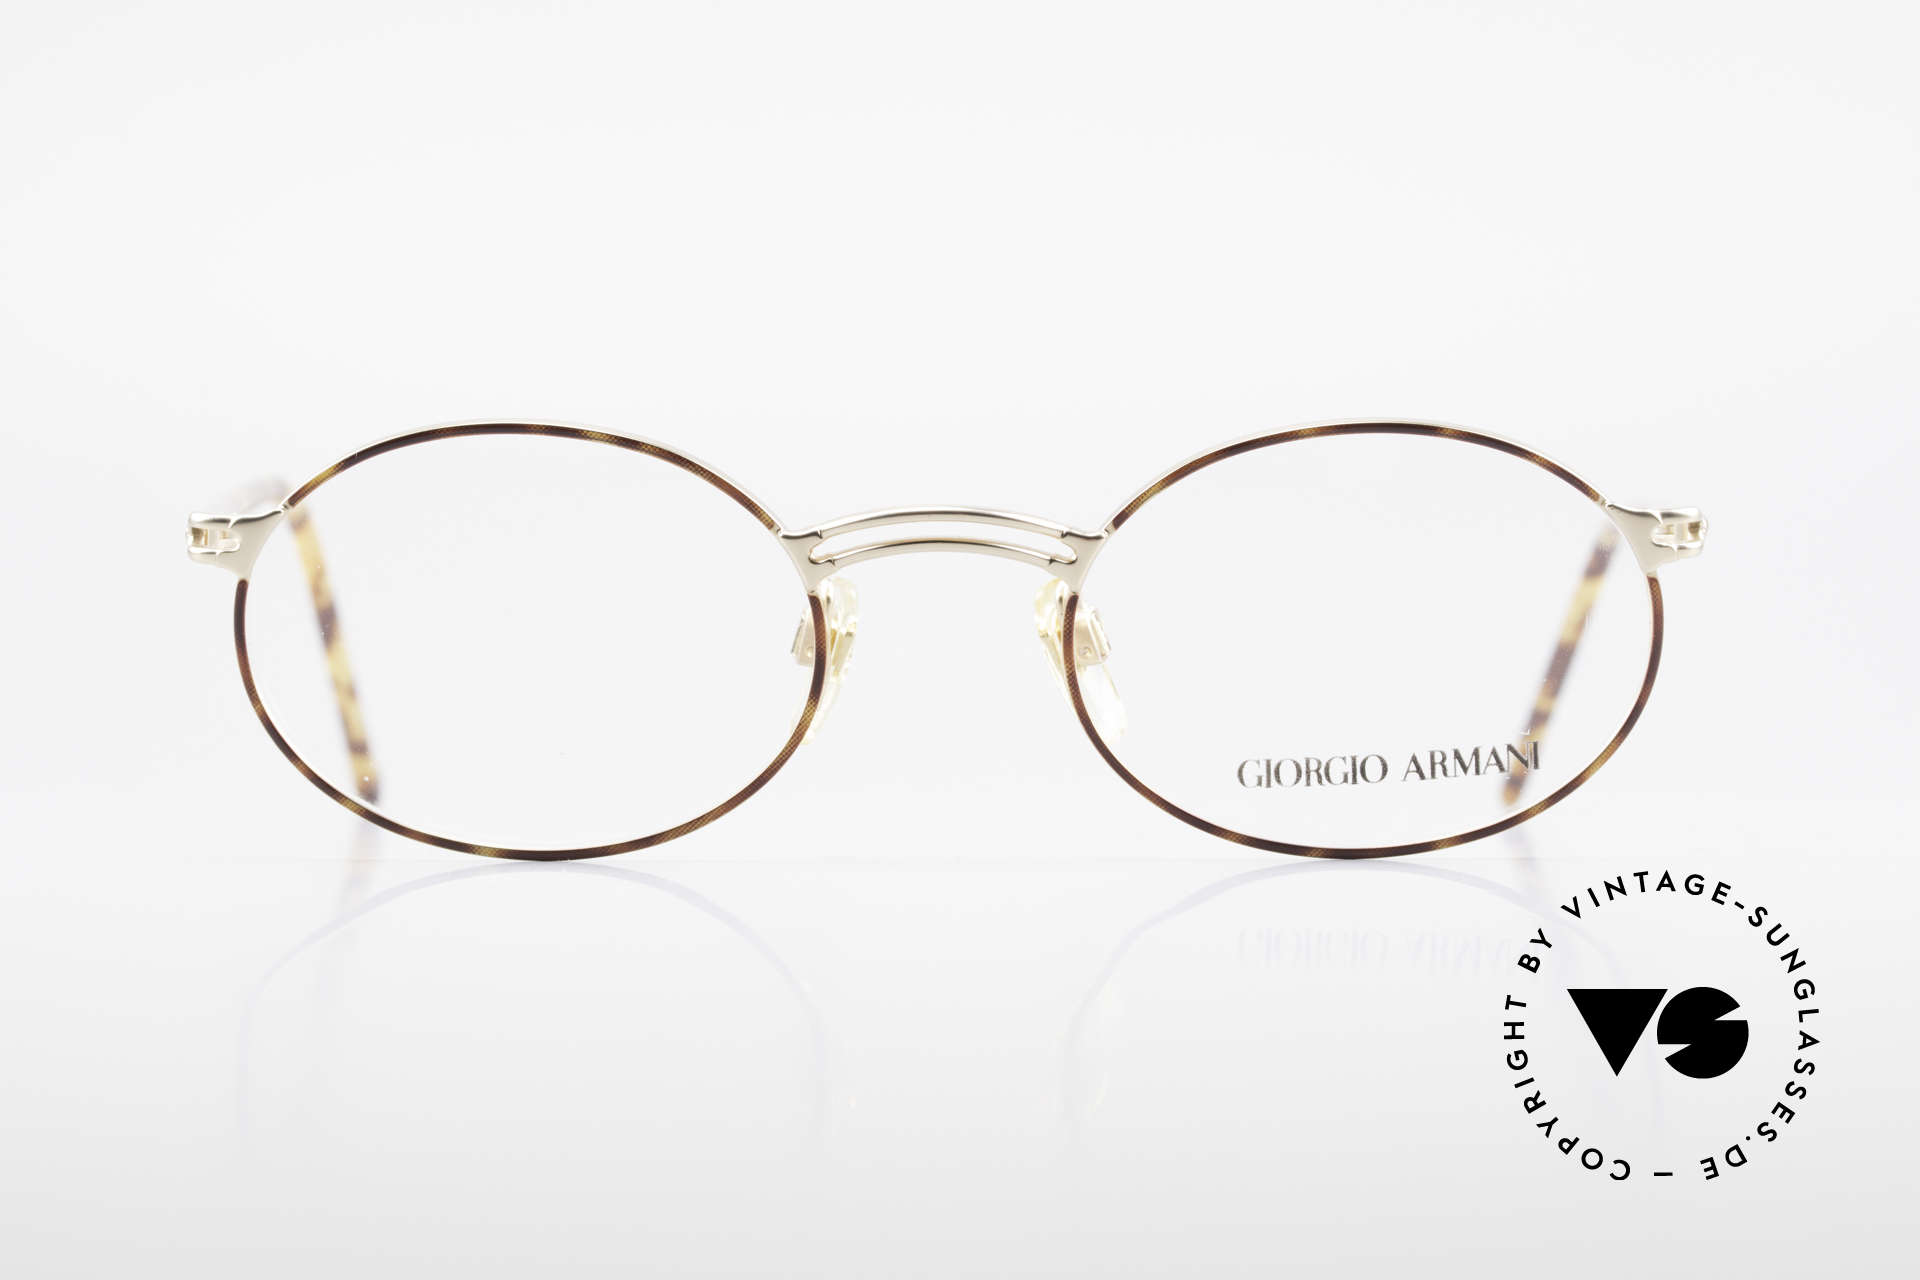 Giorgio Armani 194 Oval 90s Eyeglasses No Retro, classic 'OVAL frame Design' - a real timeless classic, Made for Men and Women